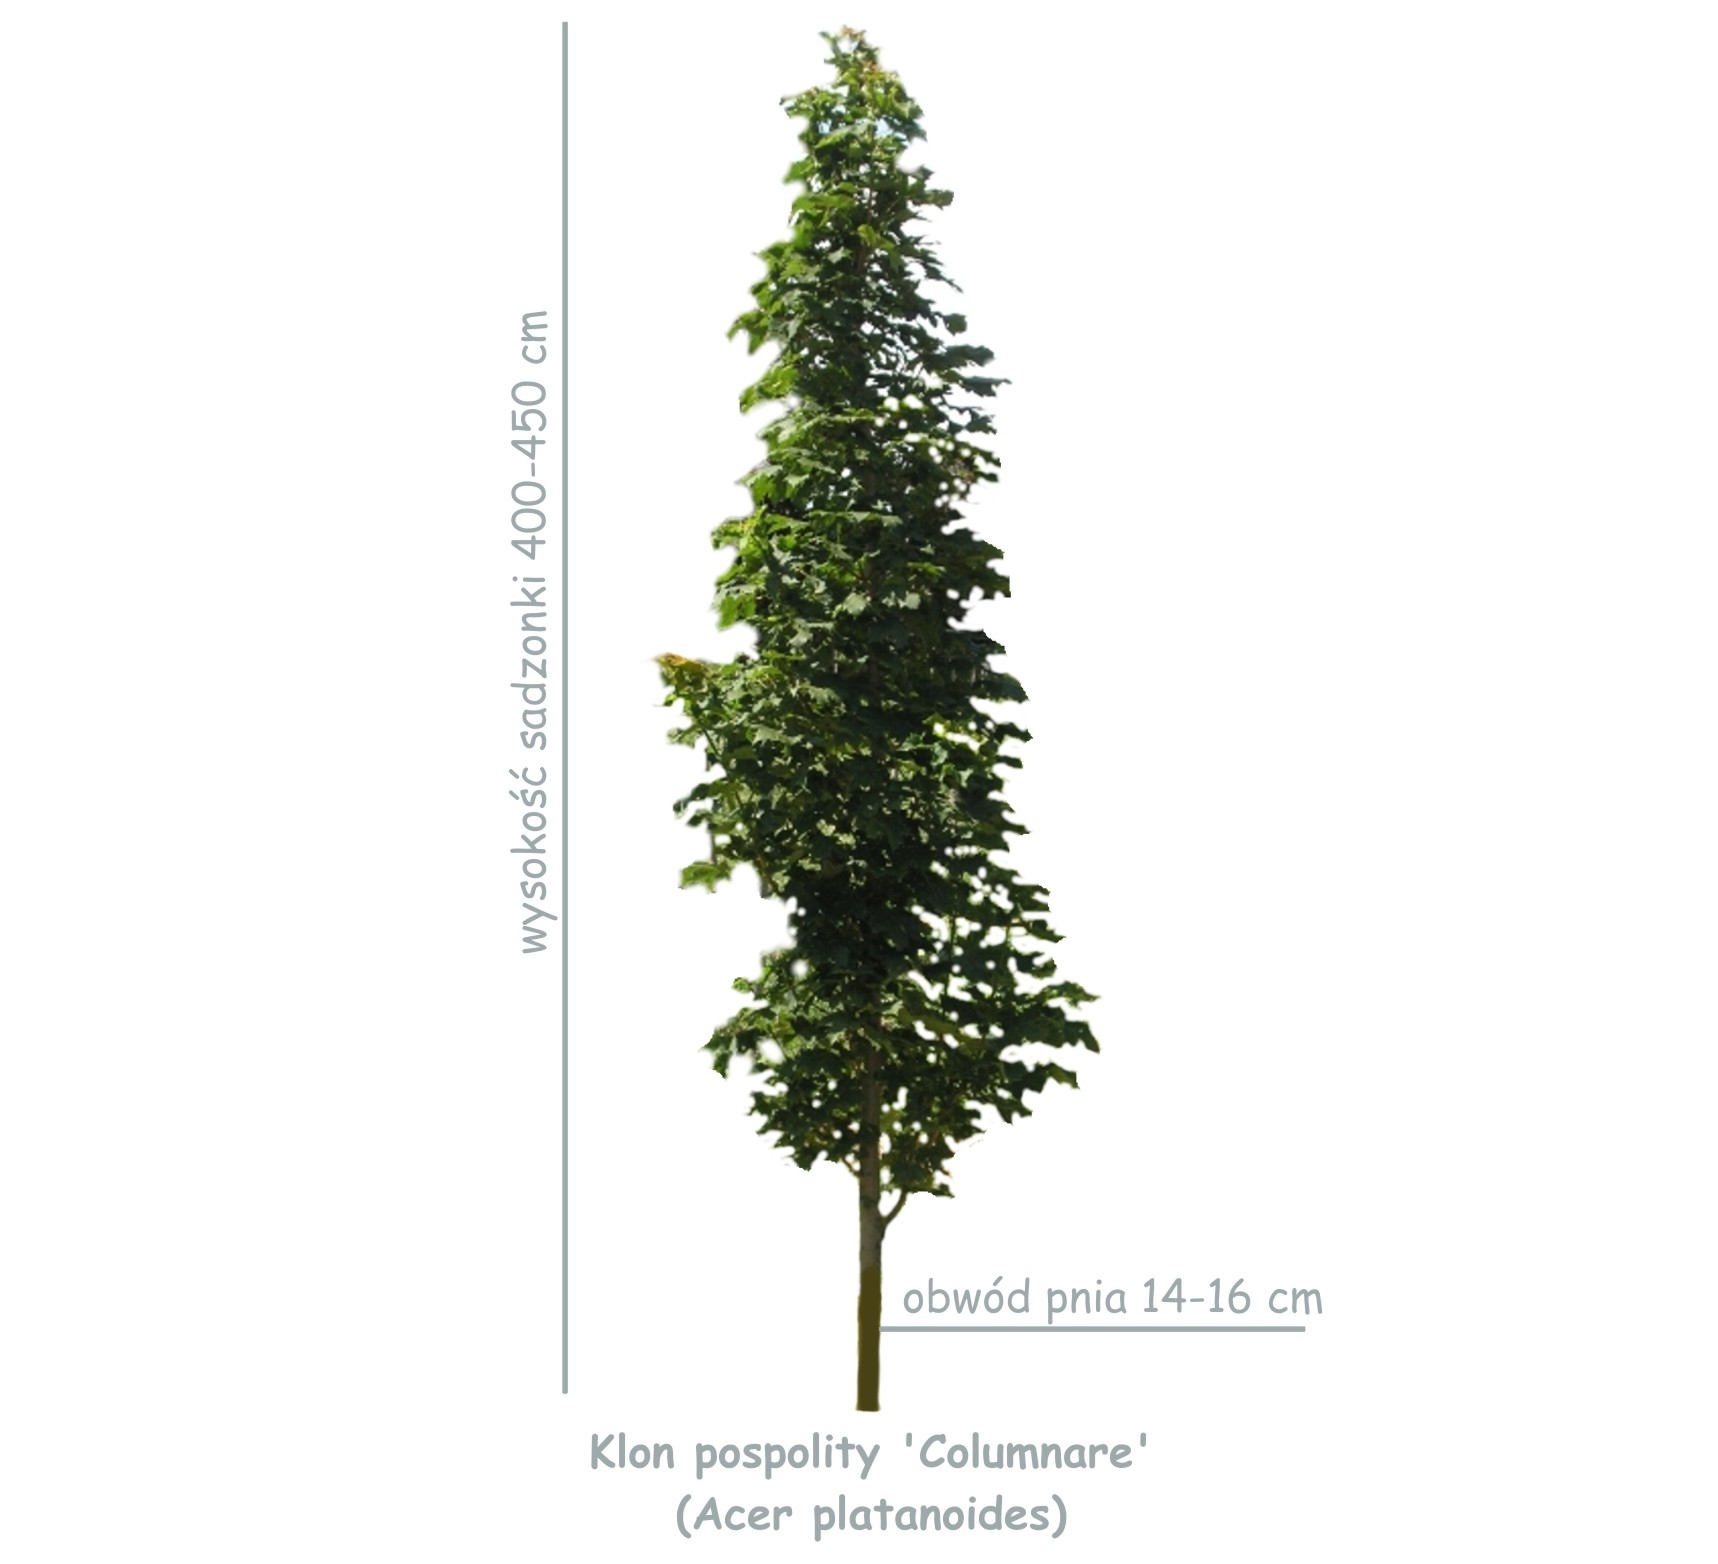 Klon pospolity 'Columnare' (Acer platanoides) sadzonka o obwodzie 14-16 cm